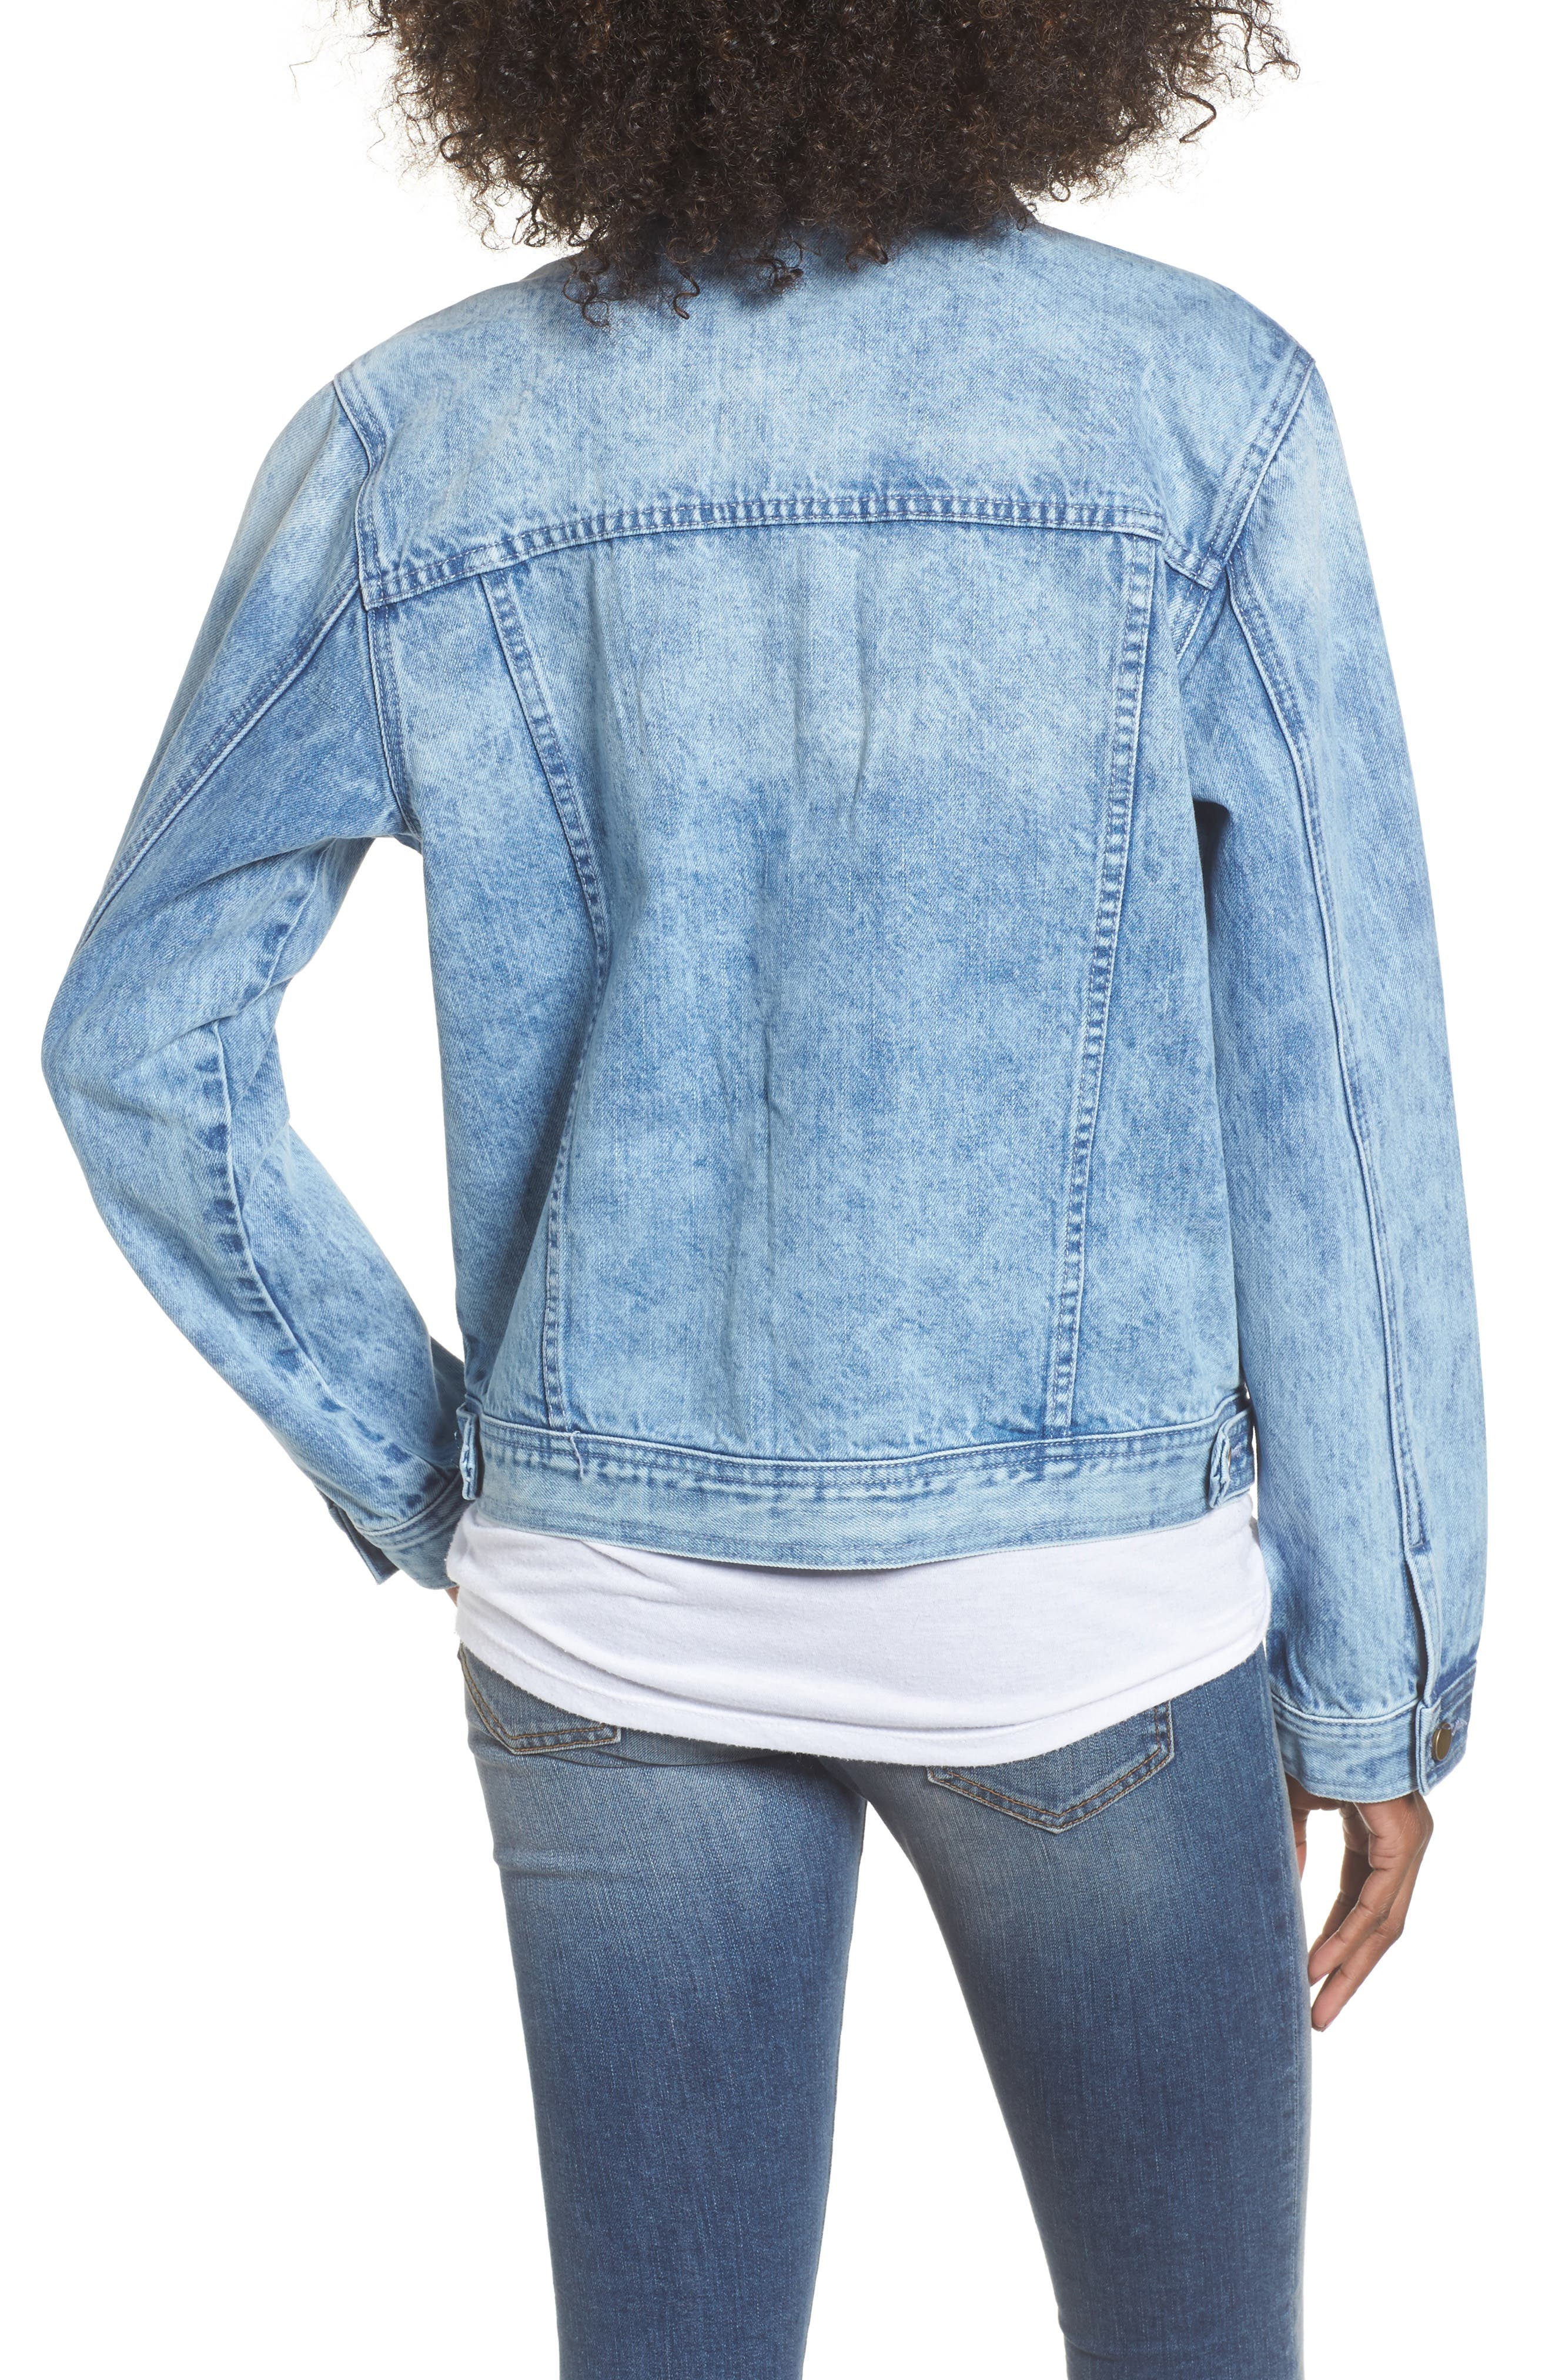 Alternate Image 2  - Tinsel Star & Stud Denim Jacket